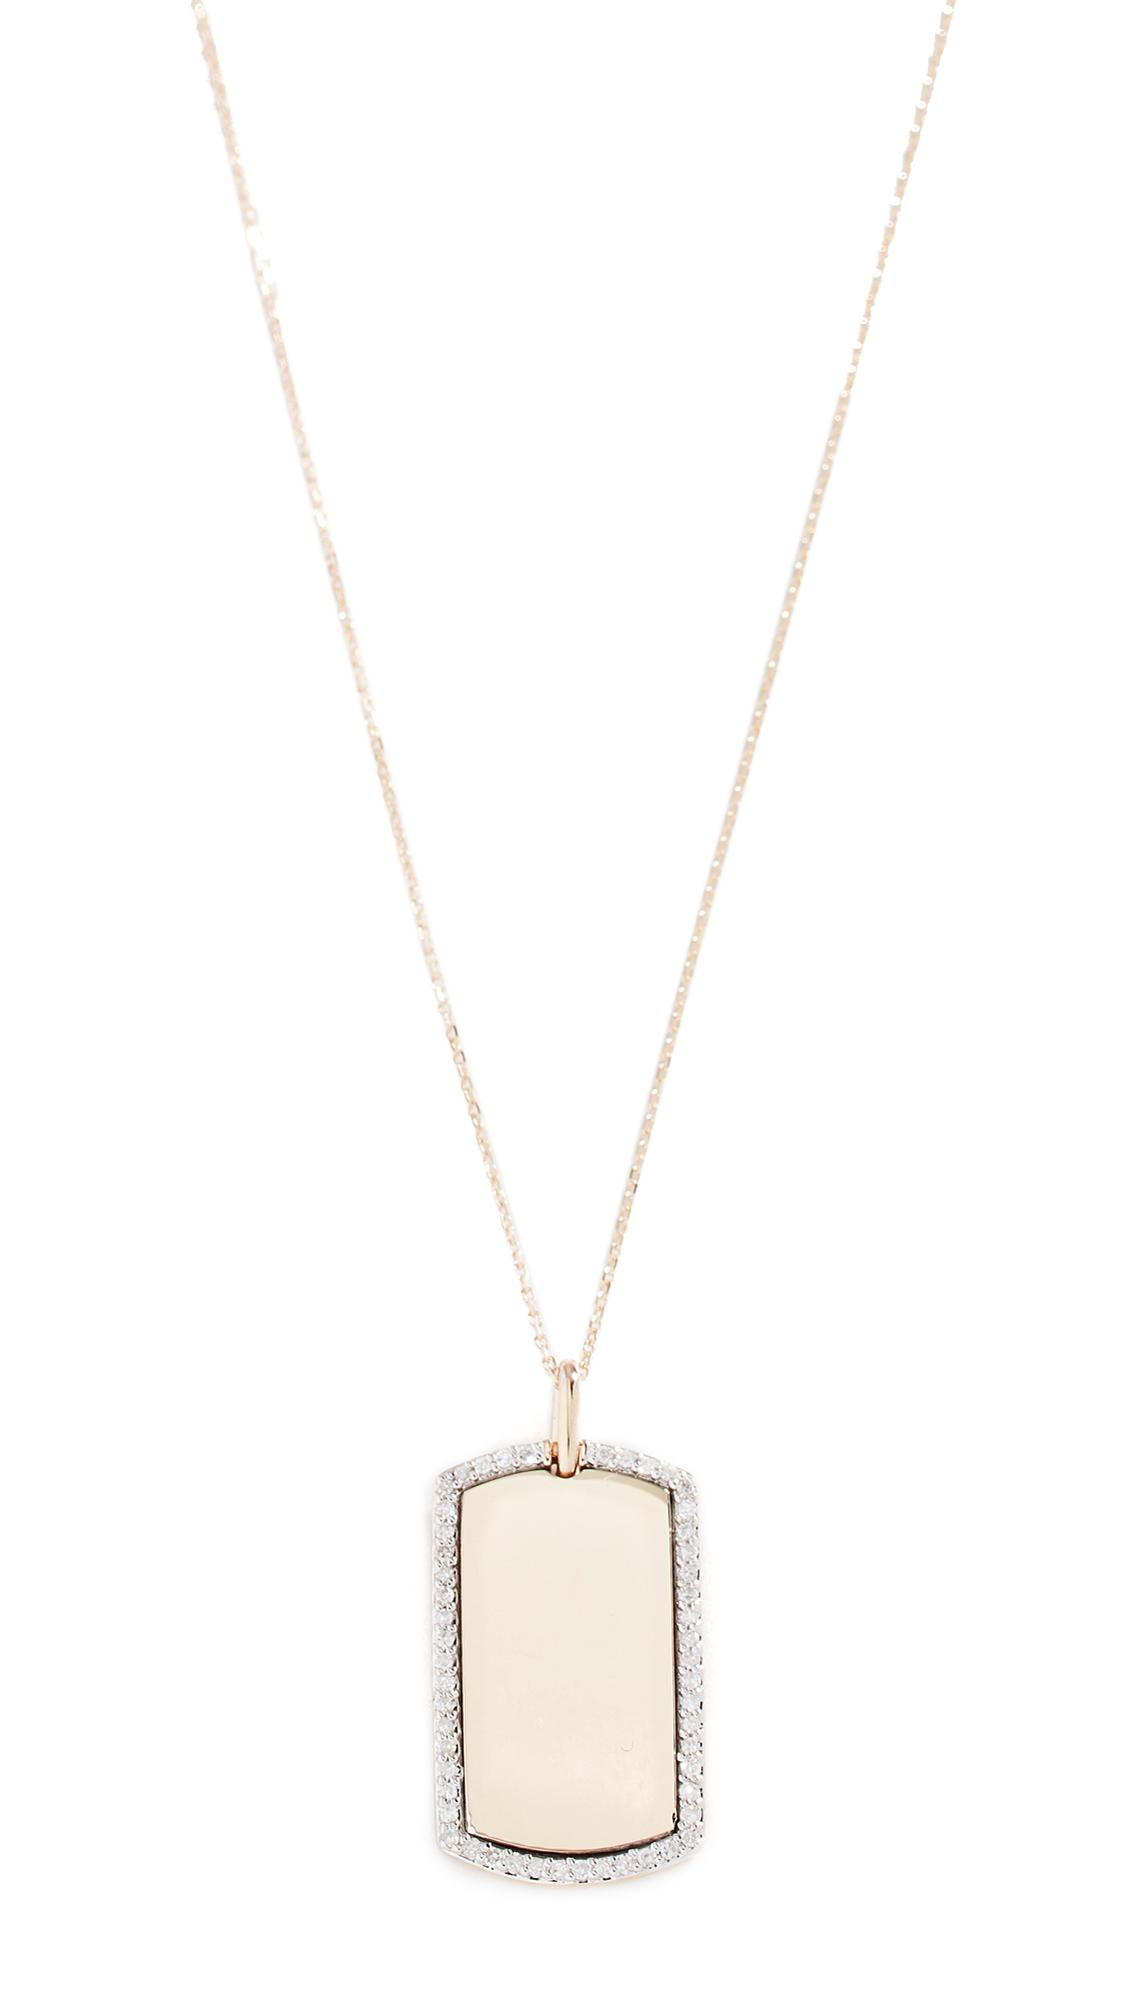 ADINA REYTER 14K Diamond Dog Tag Necklace in Gold